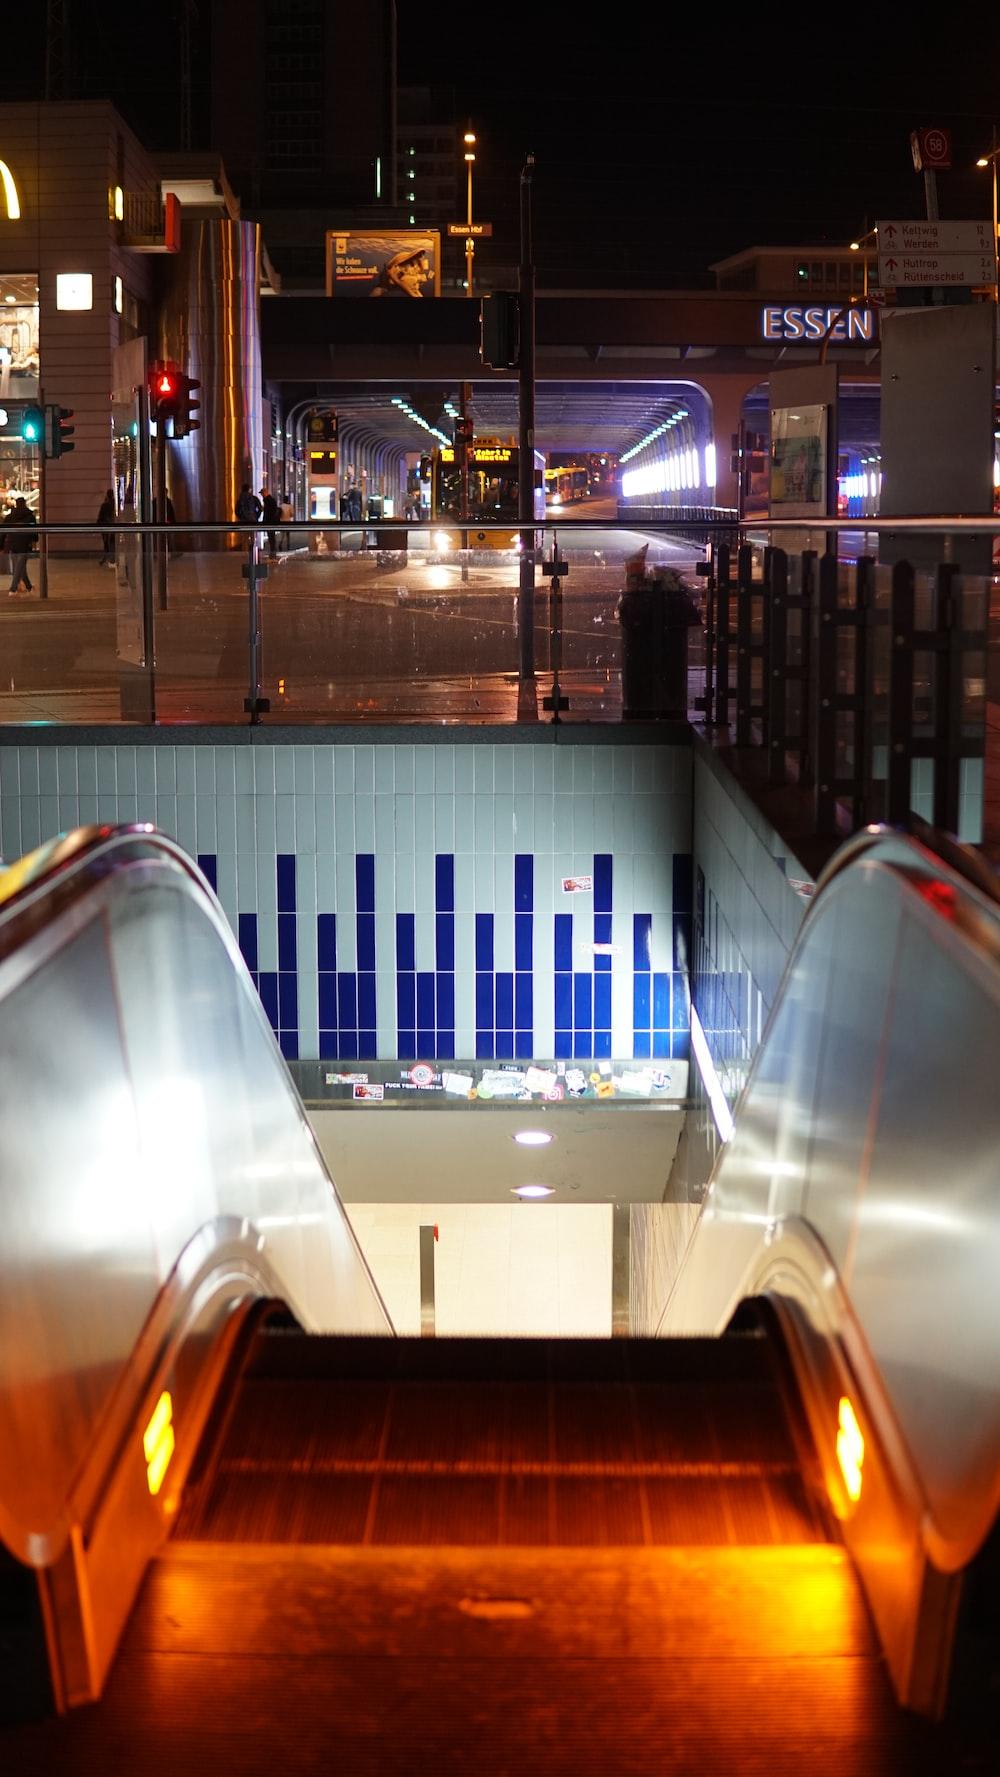 gray escalator during nighttime photo